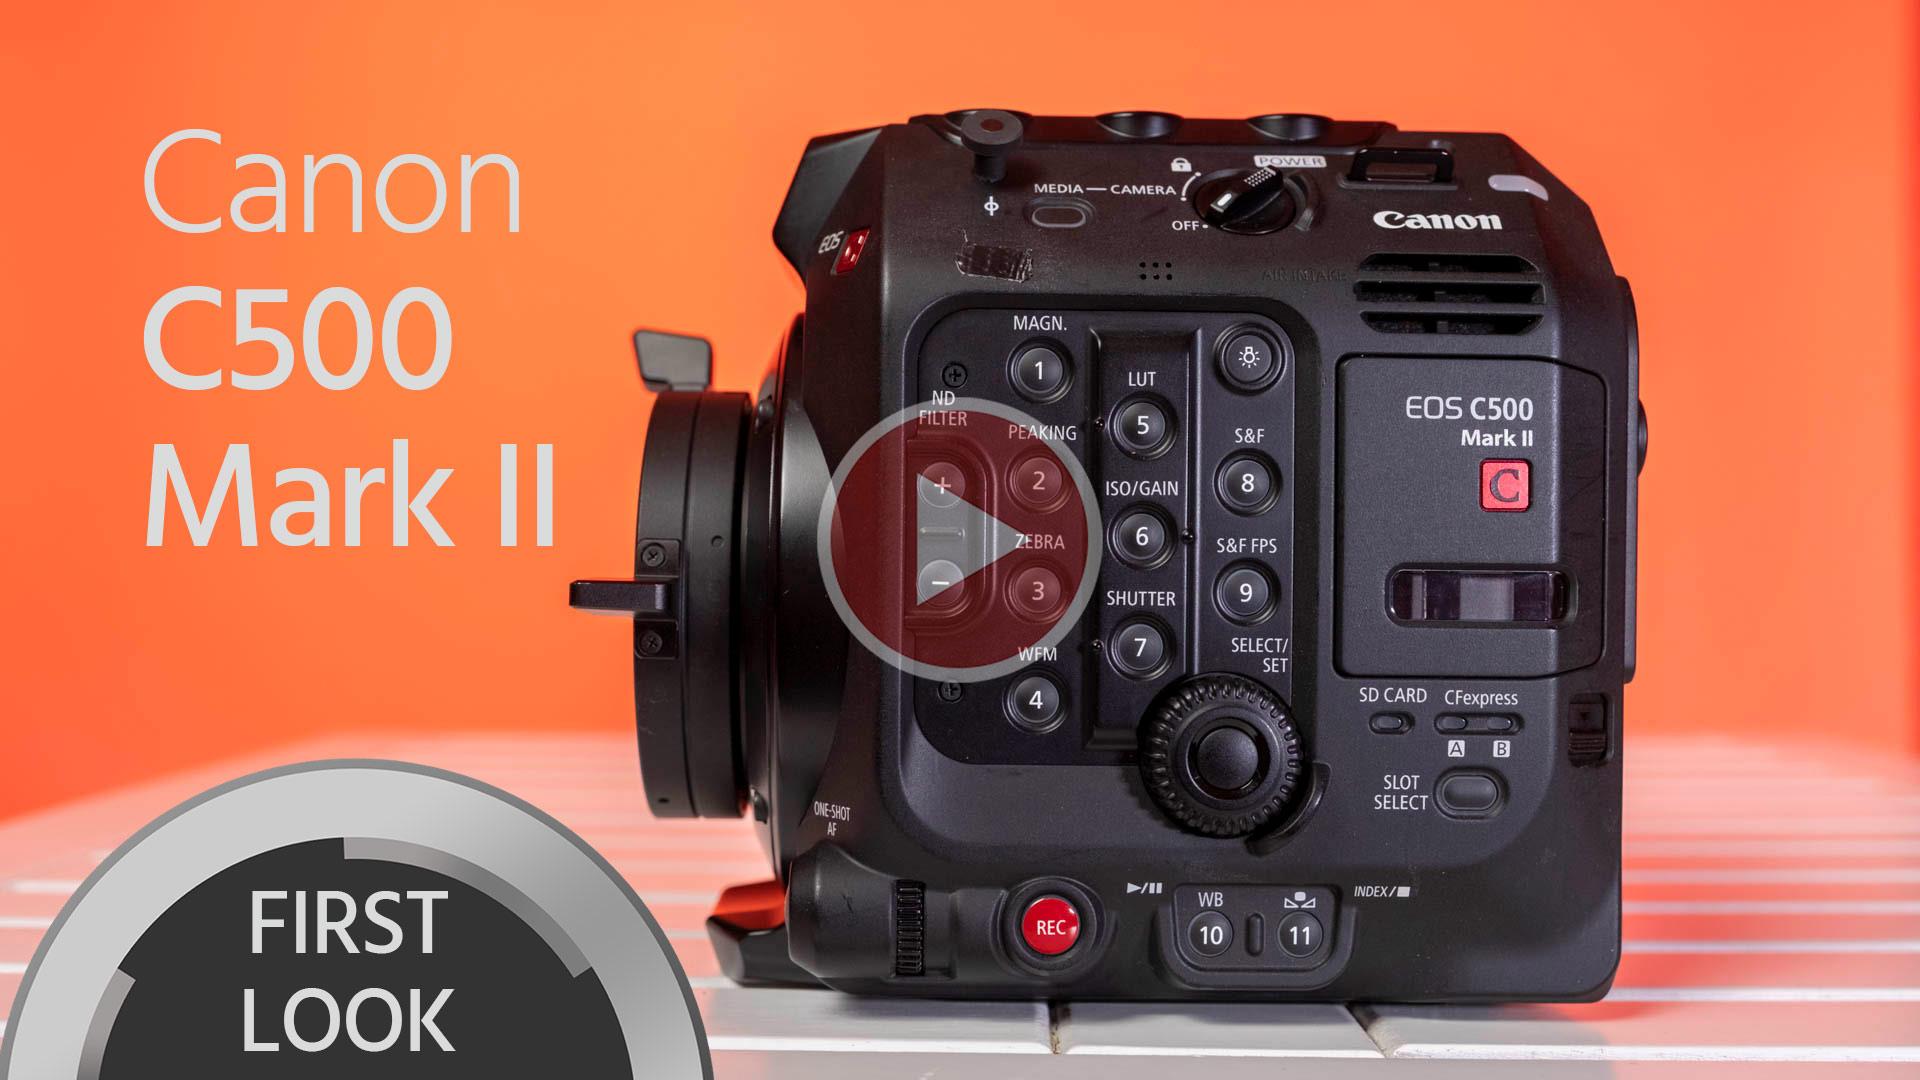 Canon C500 Mark II, primera impresión - 6K, full frame, cinema RAW Light, concepto modular